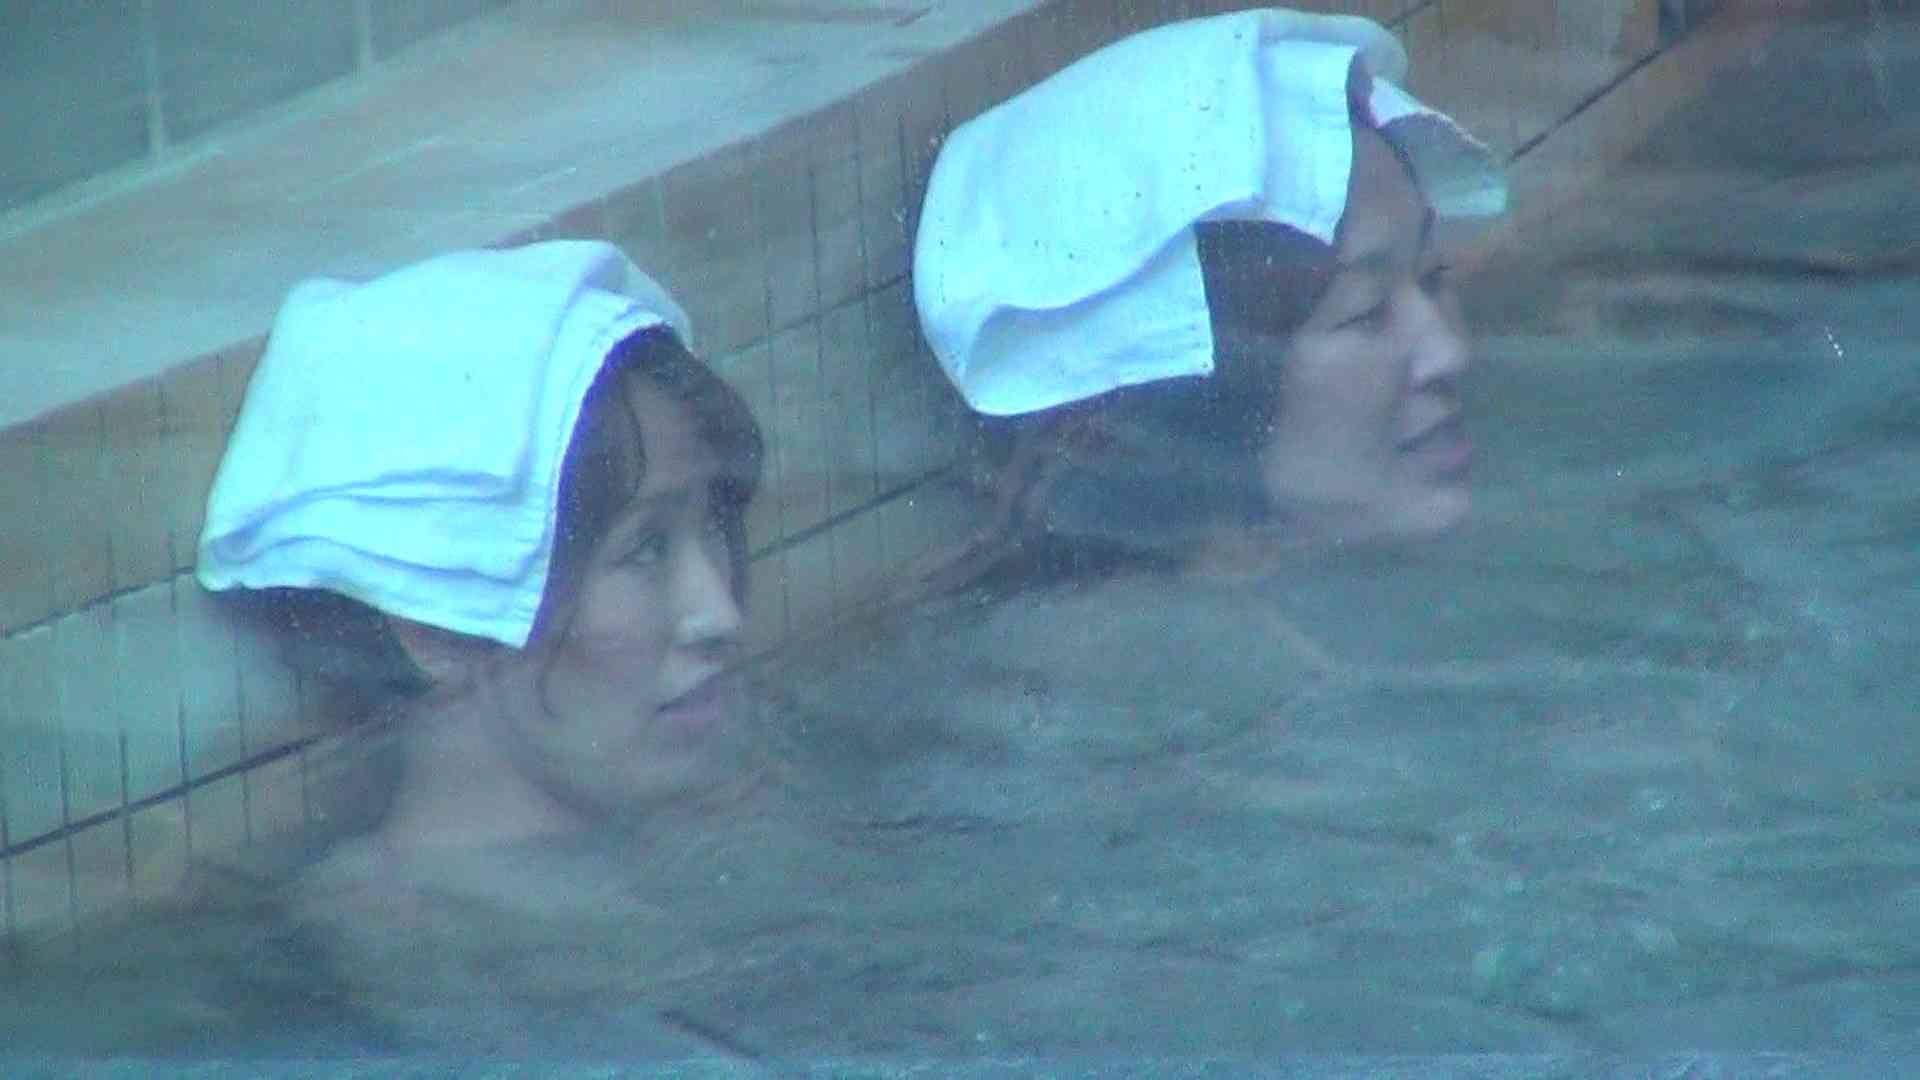 Aquaな露天風呂Vol.272 盗撮 われめAV動画紹介 99PICs 29